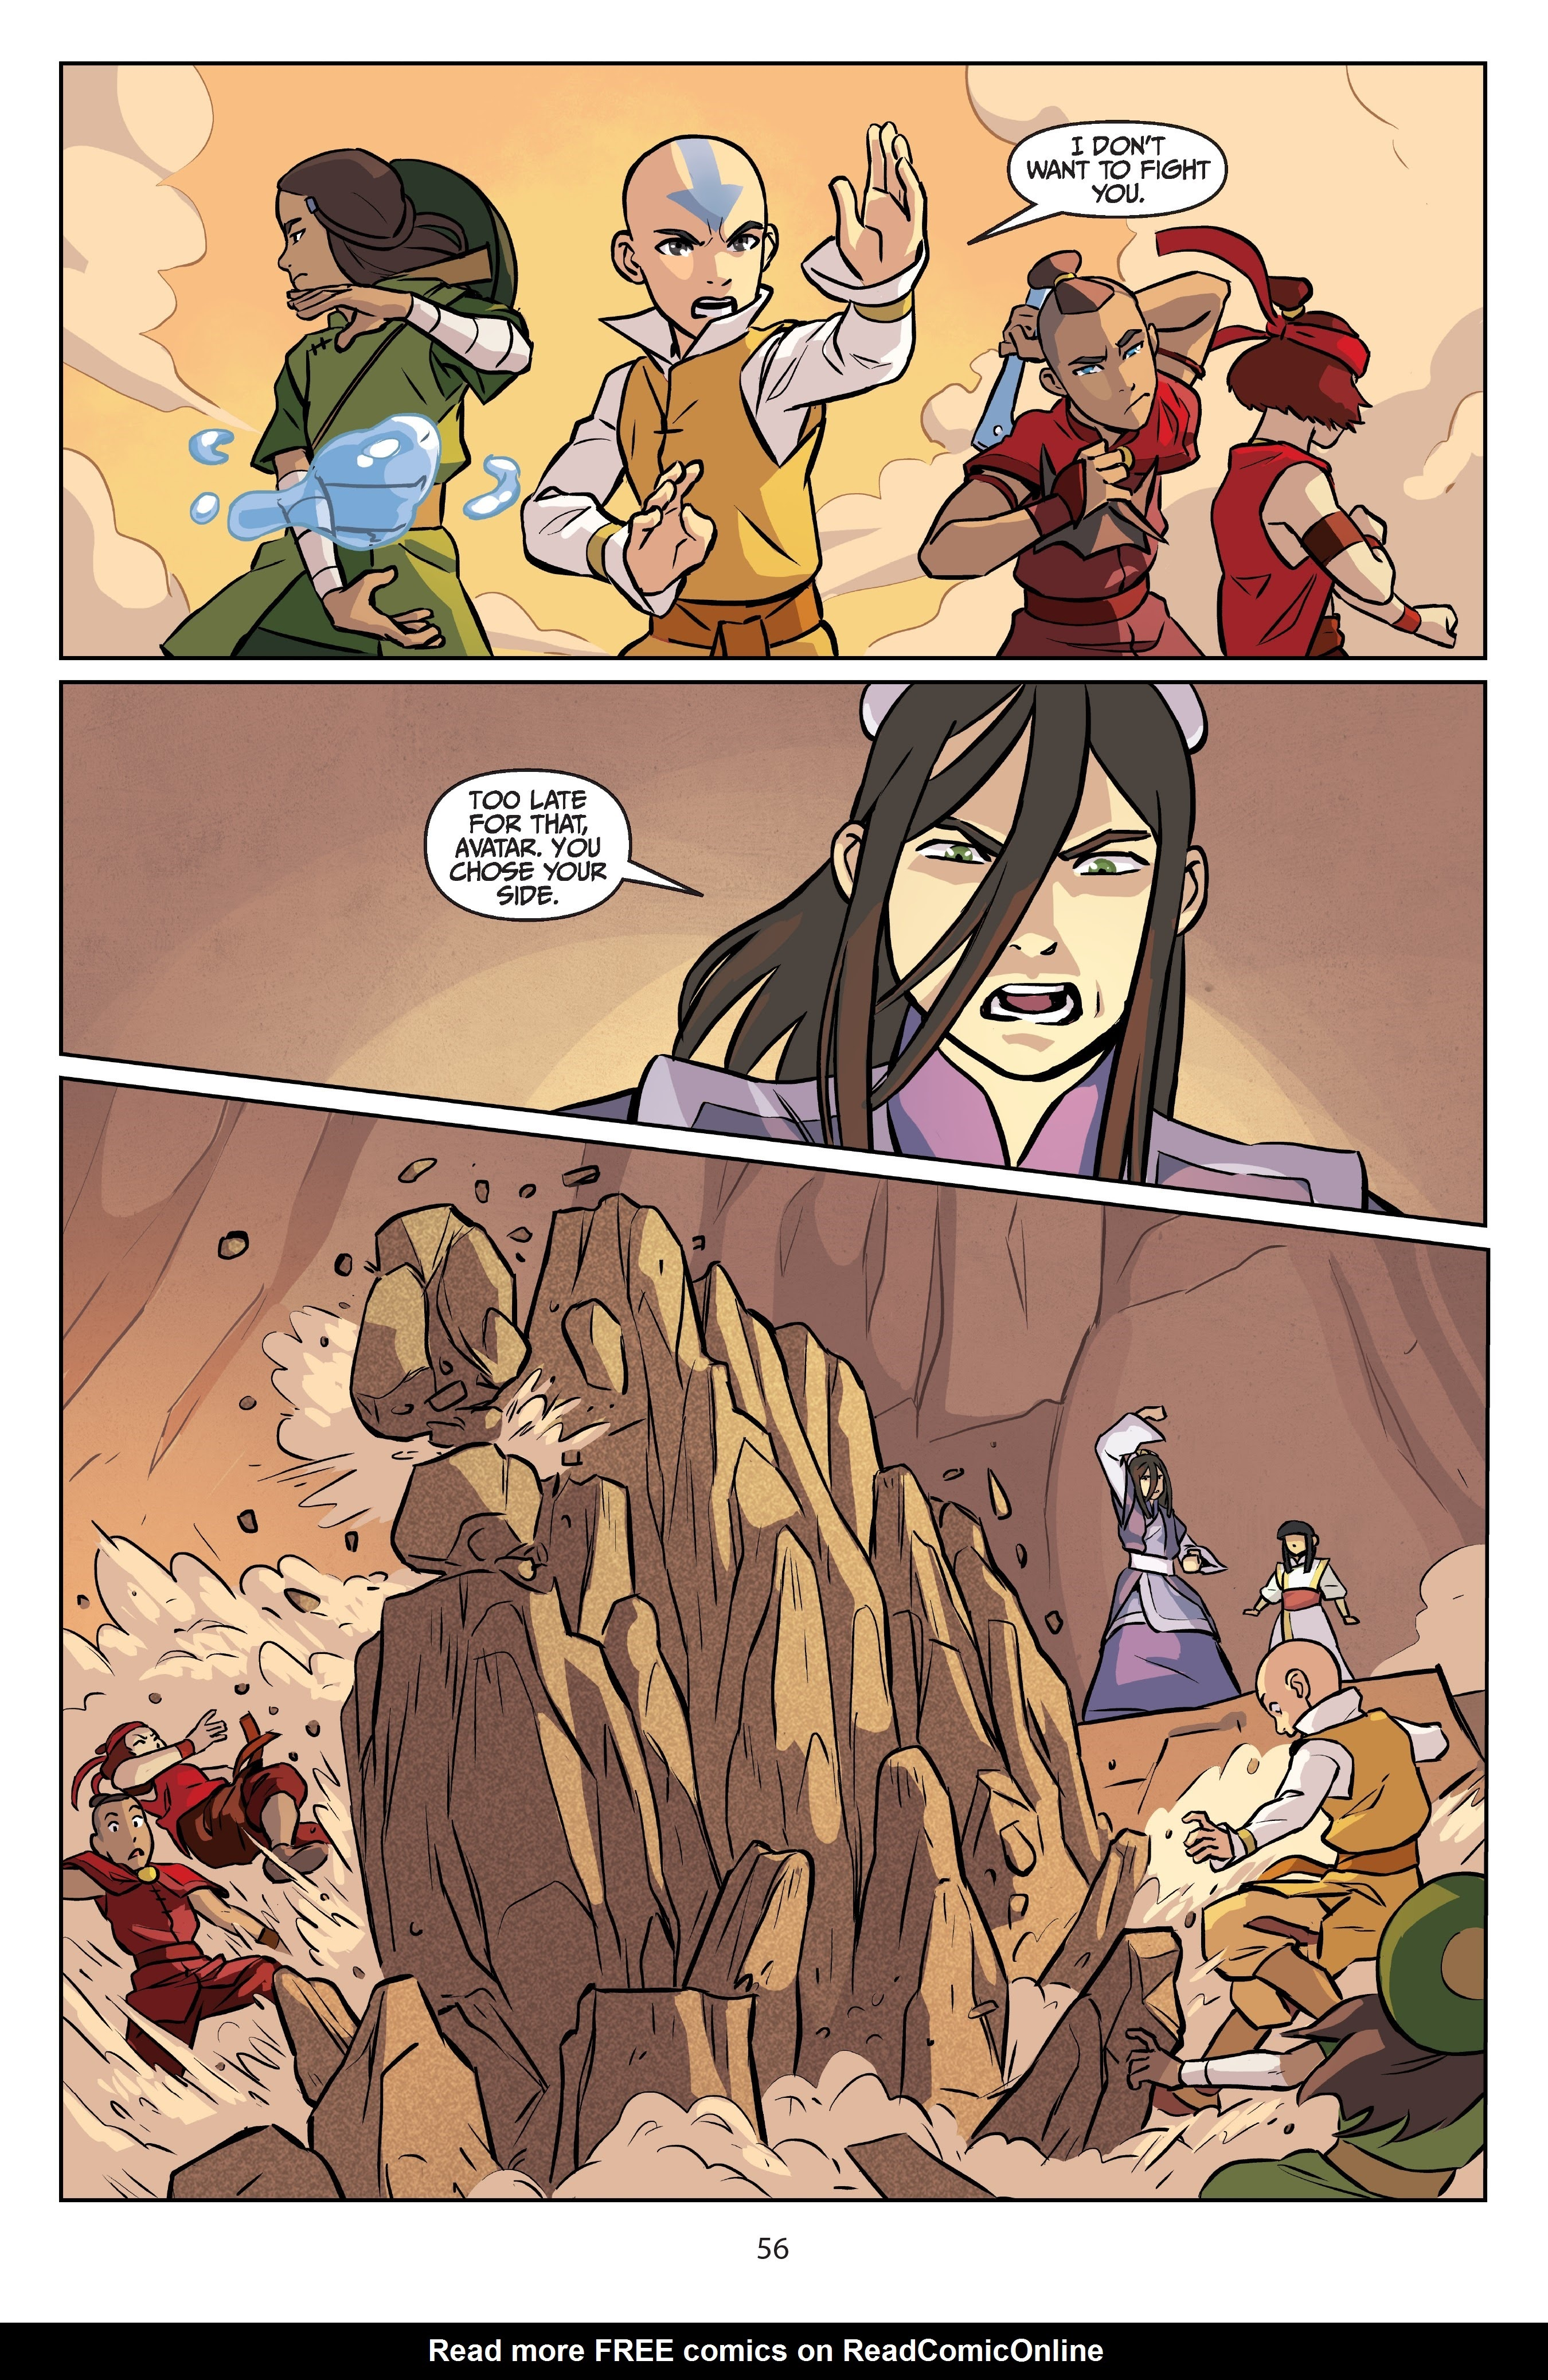 Nickelodeon Avatar: The Last Airbender - Imbalance TPB_2 Page 56